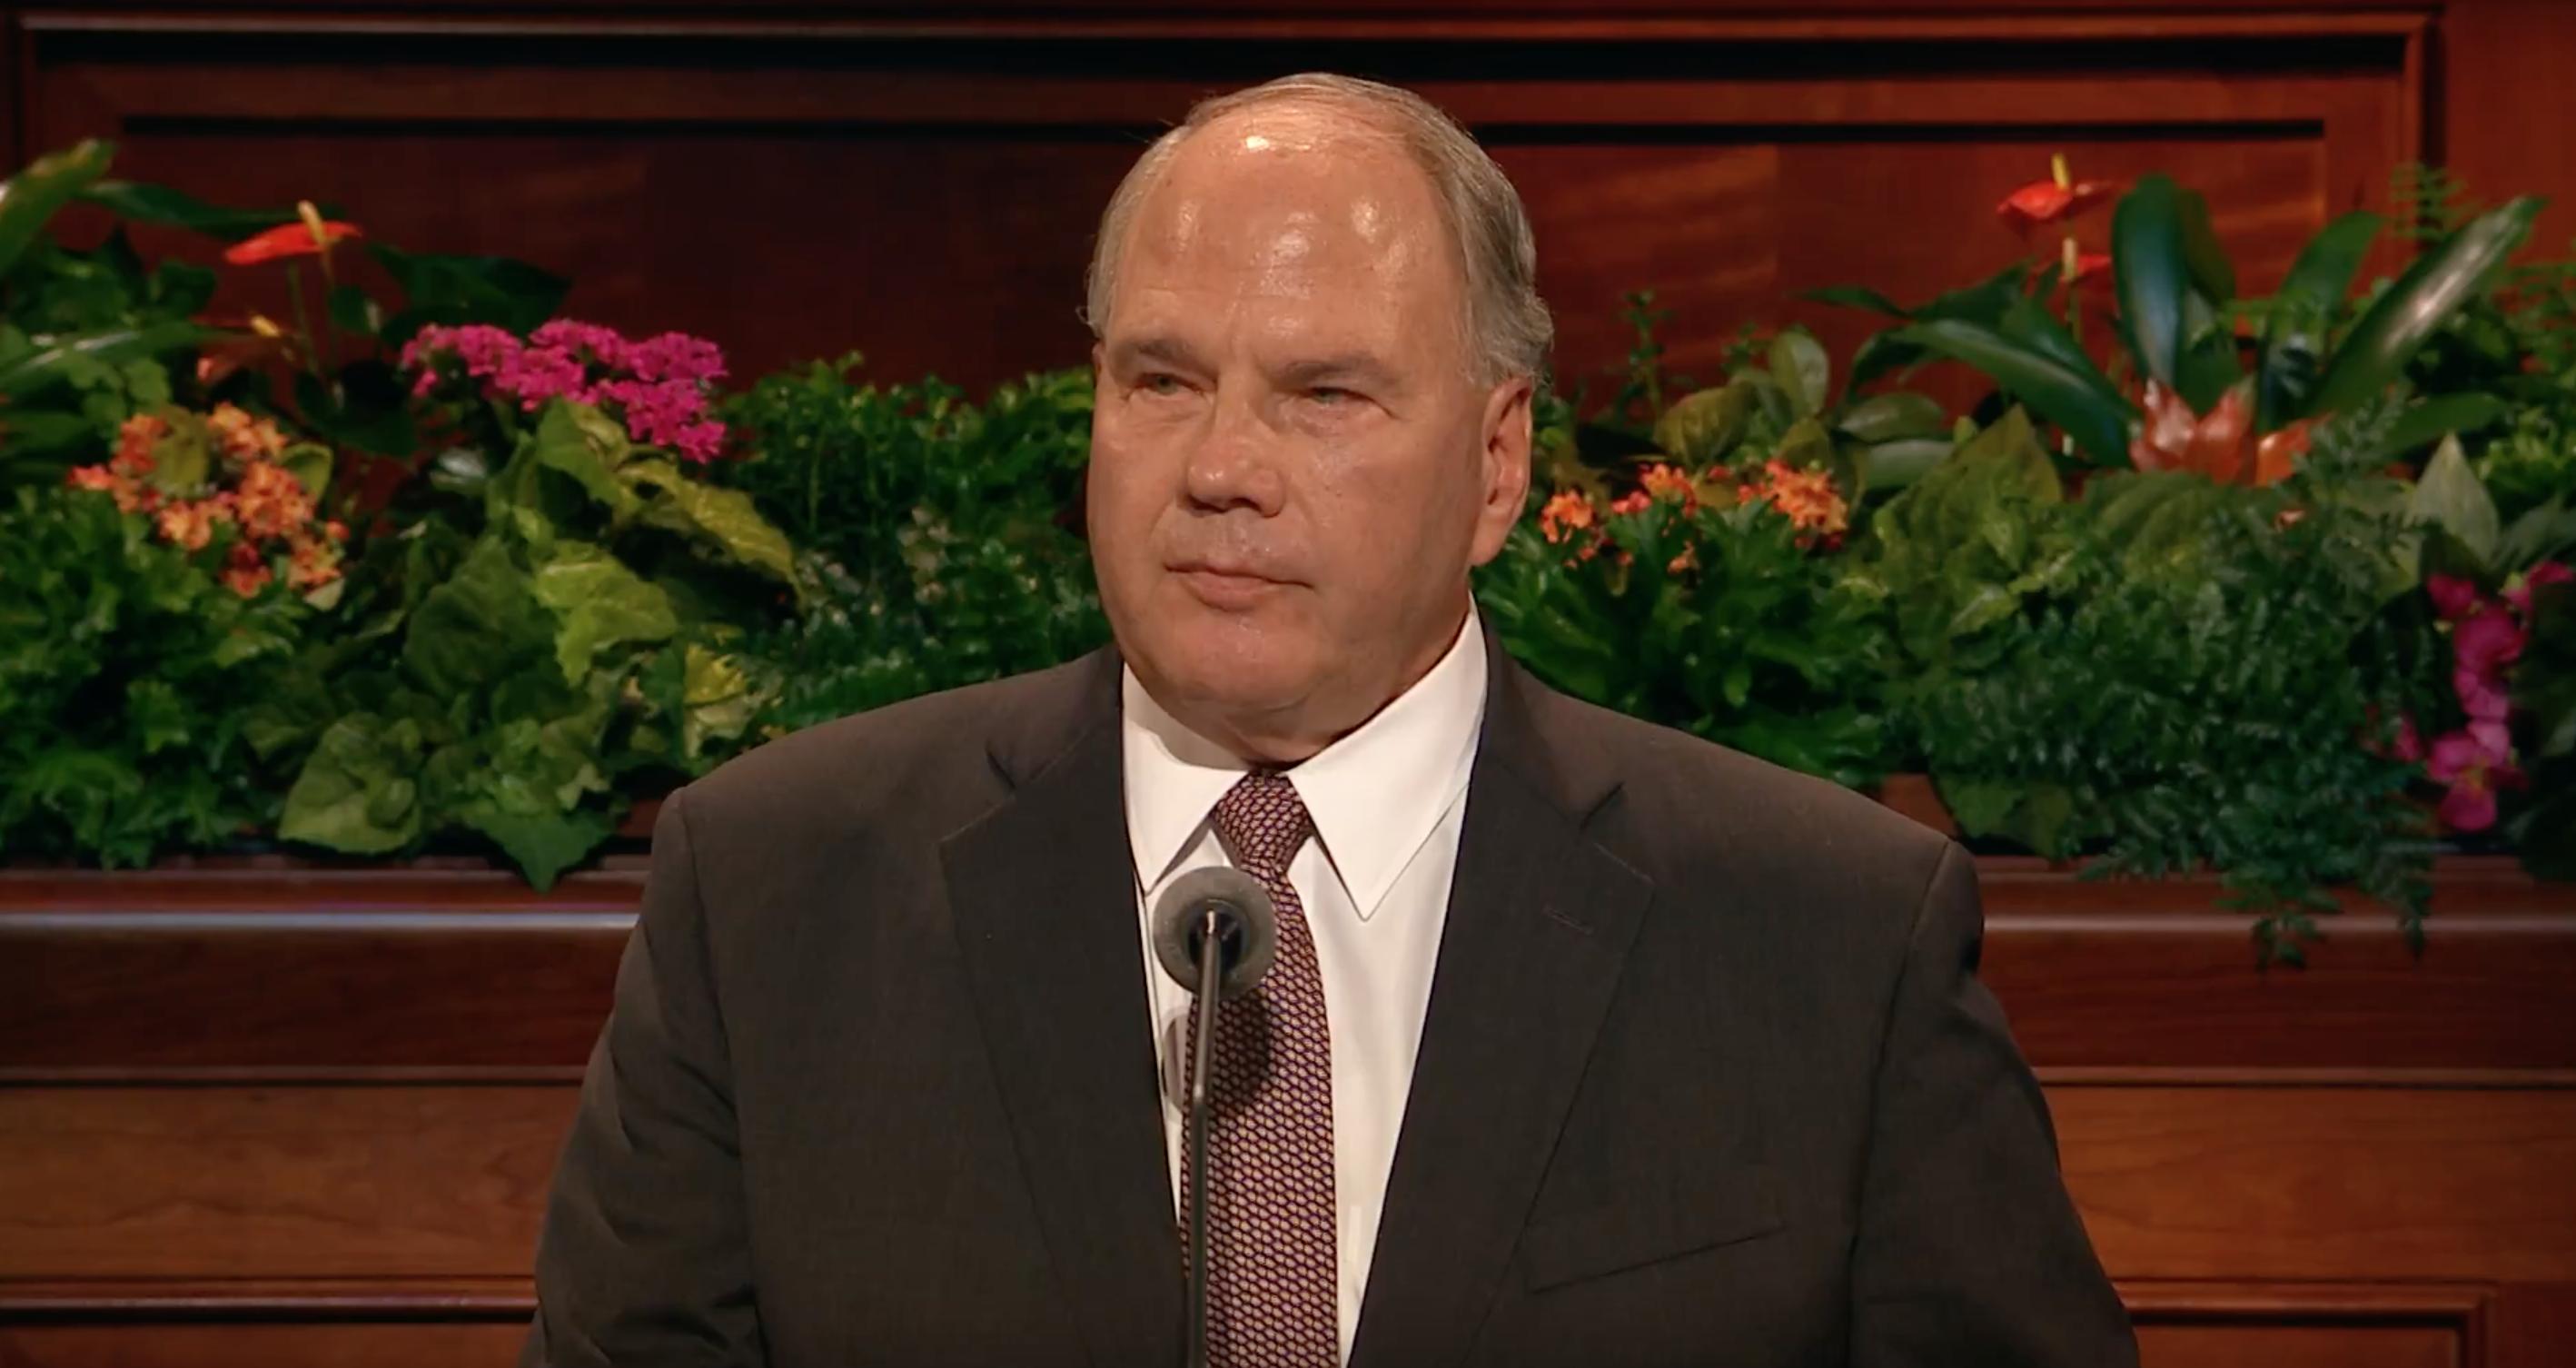 Elder Ronald A. Rasband gives his October 2018 general conference address.